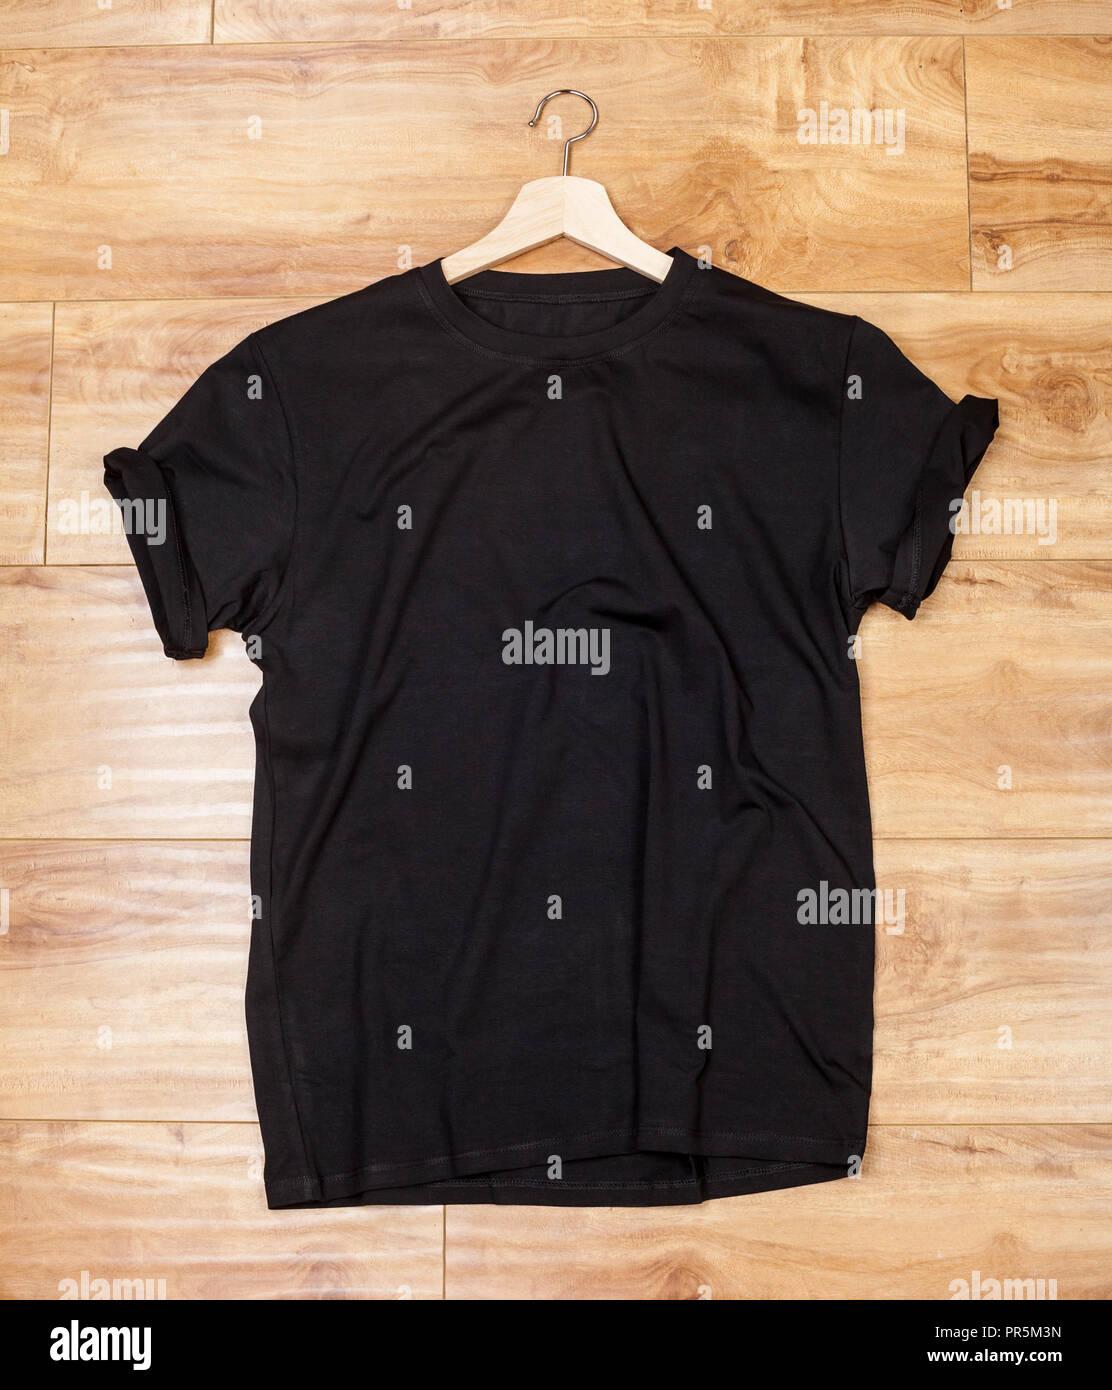 Wrinkled black plain short sleeved cotton T-Shirt on a planket wooden background - Stock Image